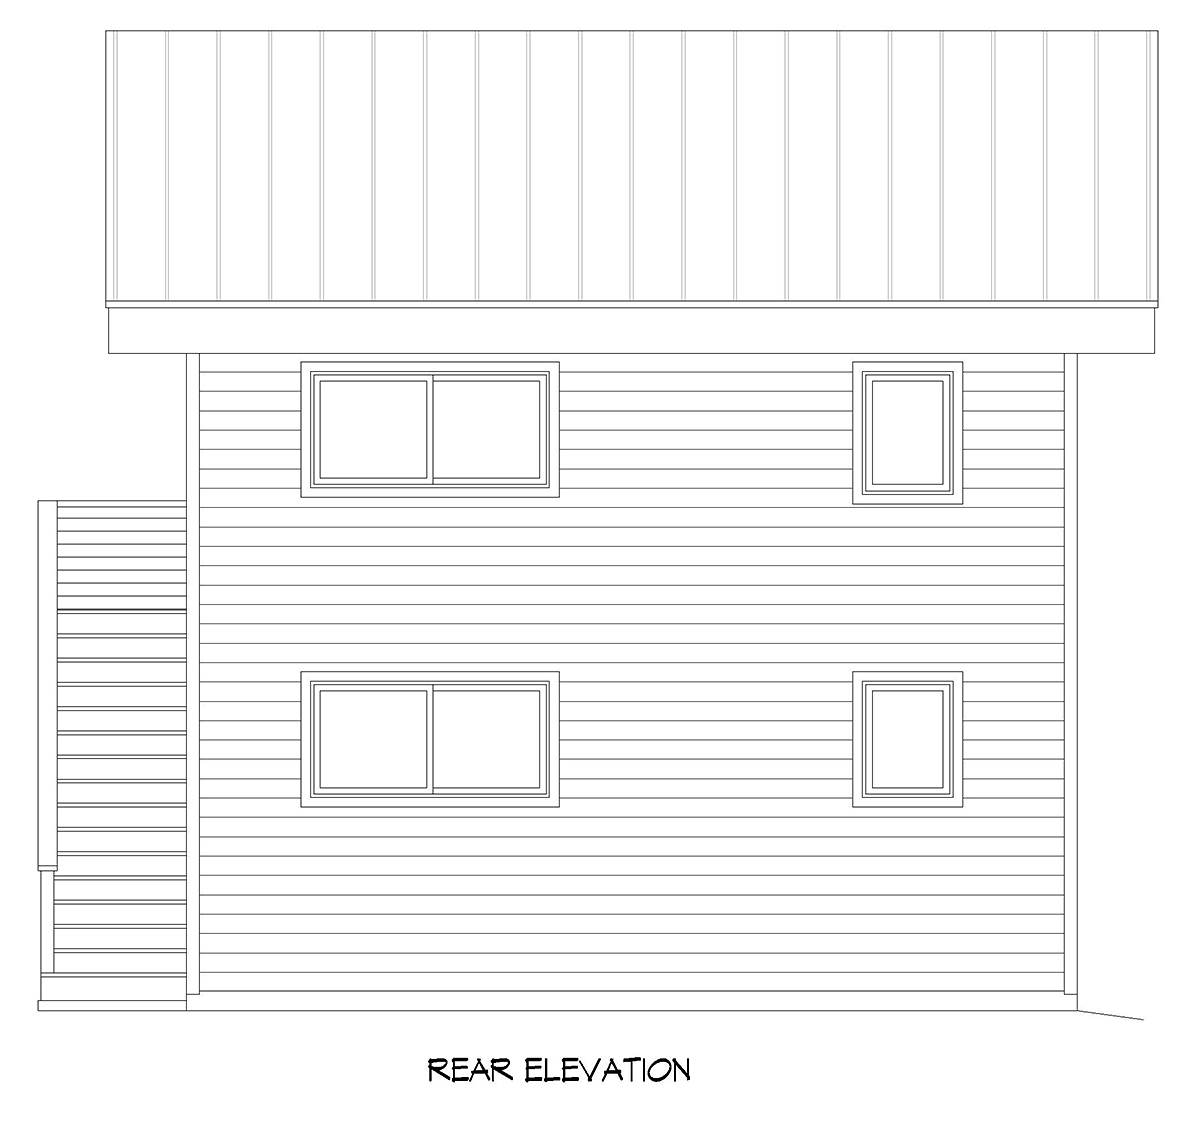 Coastal, Contemporary, Modern Garage-Living Plan 40896 with 2 Beds, 2 Baths, 2 Car Garage Rear Elevation